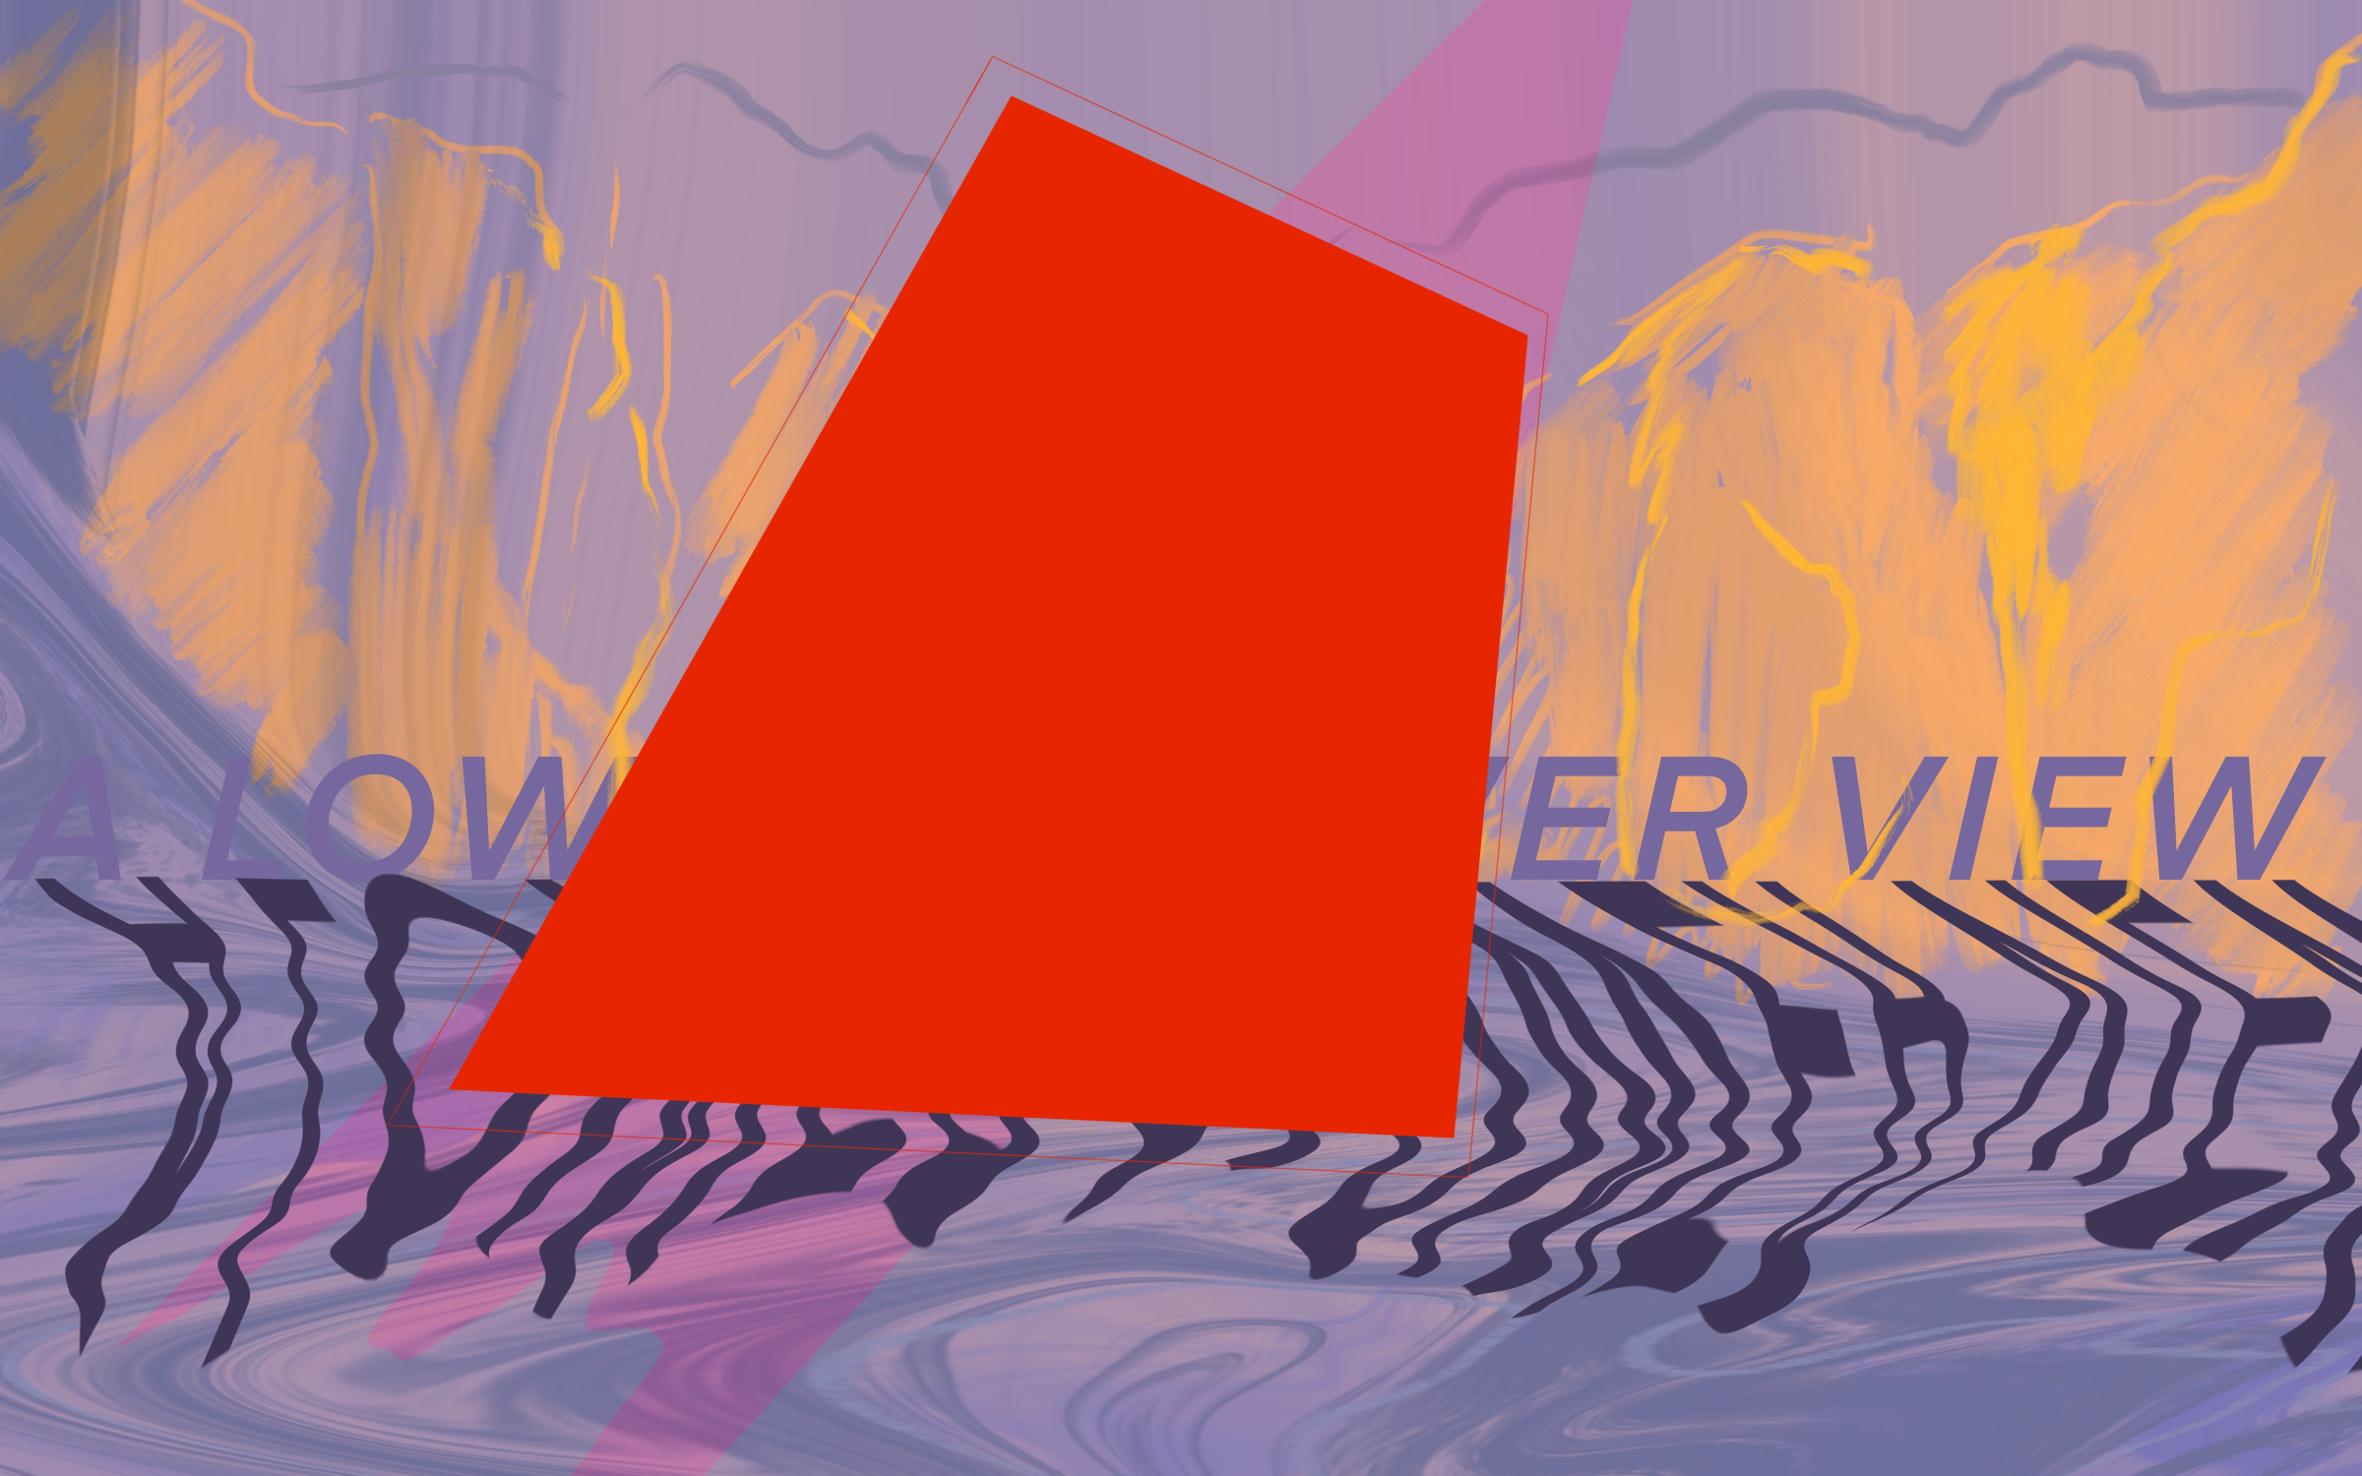 Art in Windows: Adrift In Transient Spaces